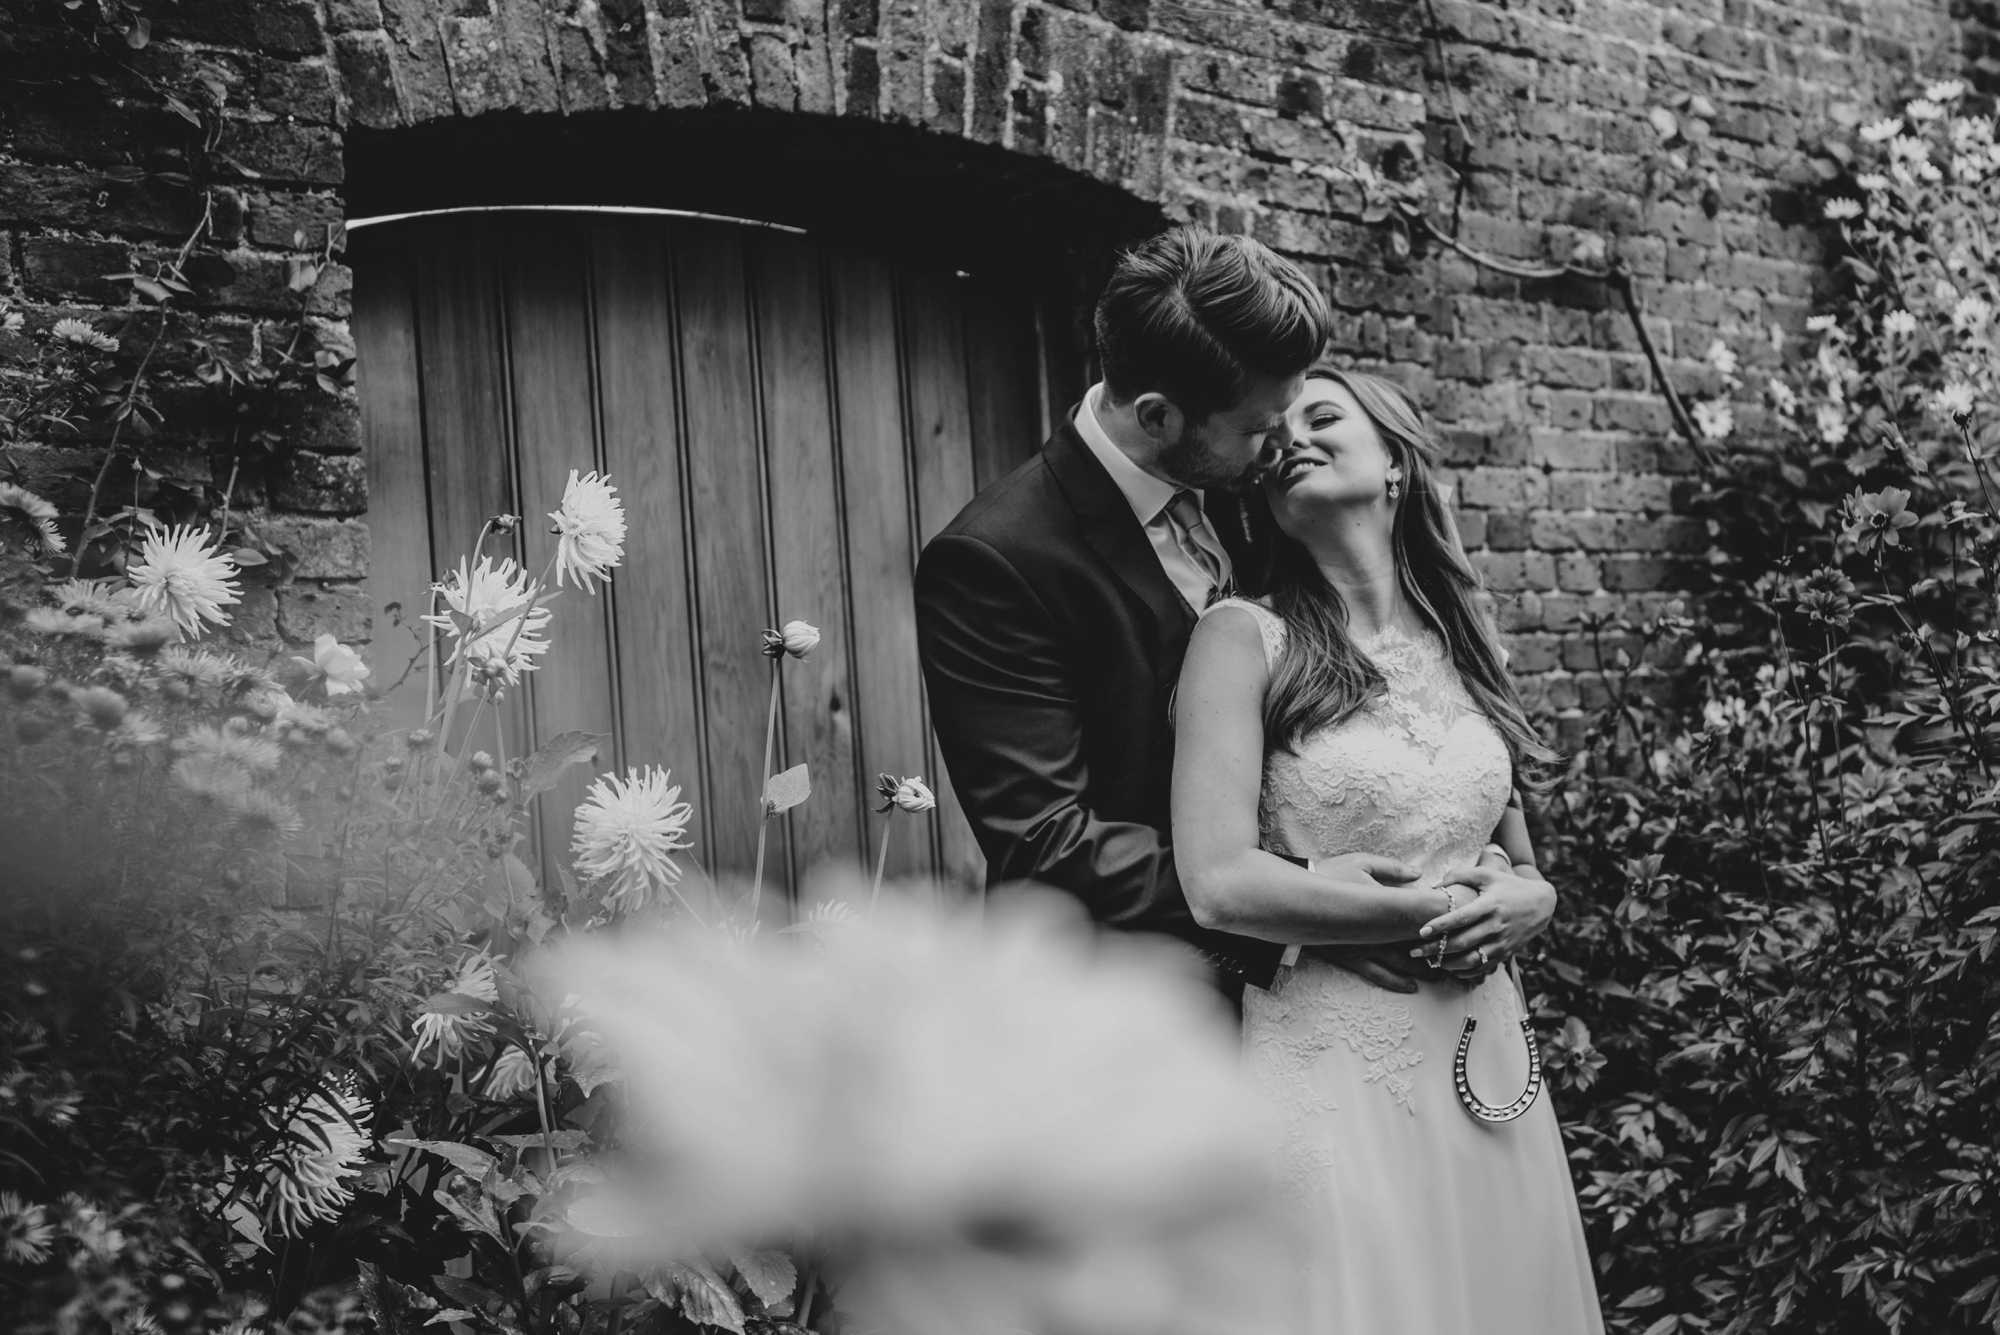 Rustic Barn Wedding with Contemporary twist at Blake Hall. Bride wears Pronovias. Essex Documentary Wedding Photographer